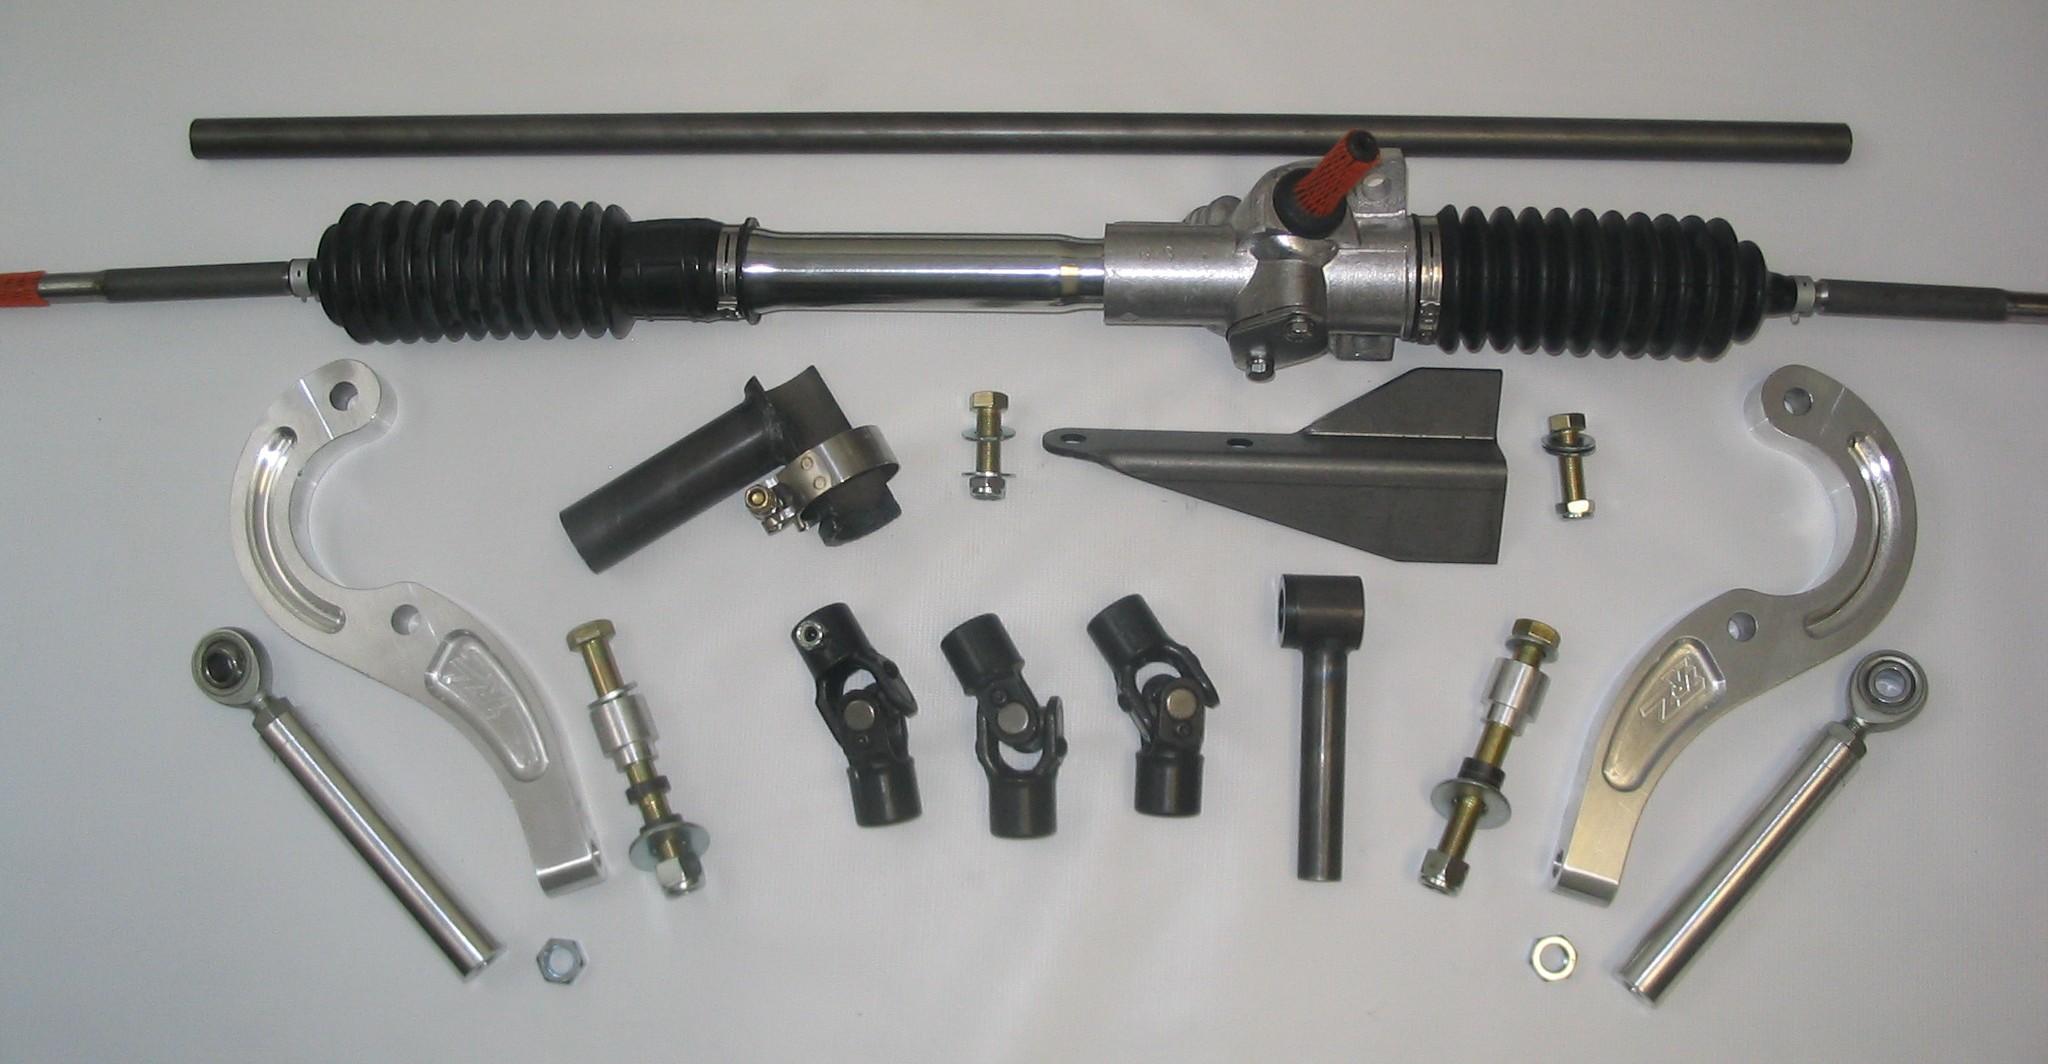 Manual Rack And Pinion Conversion Kit